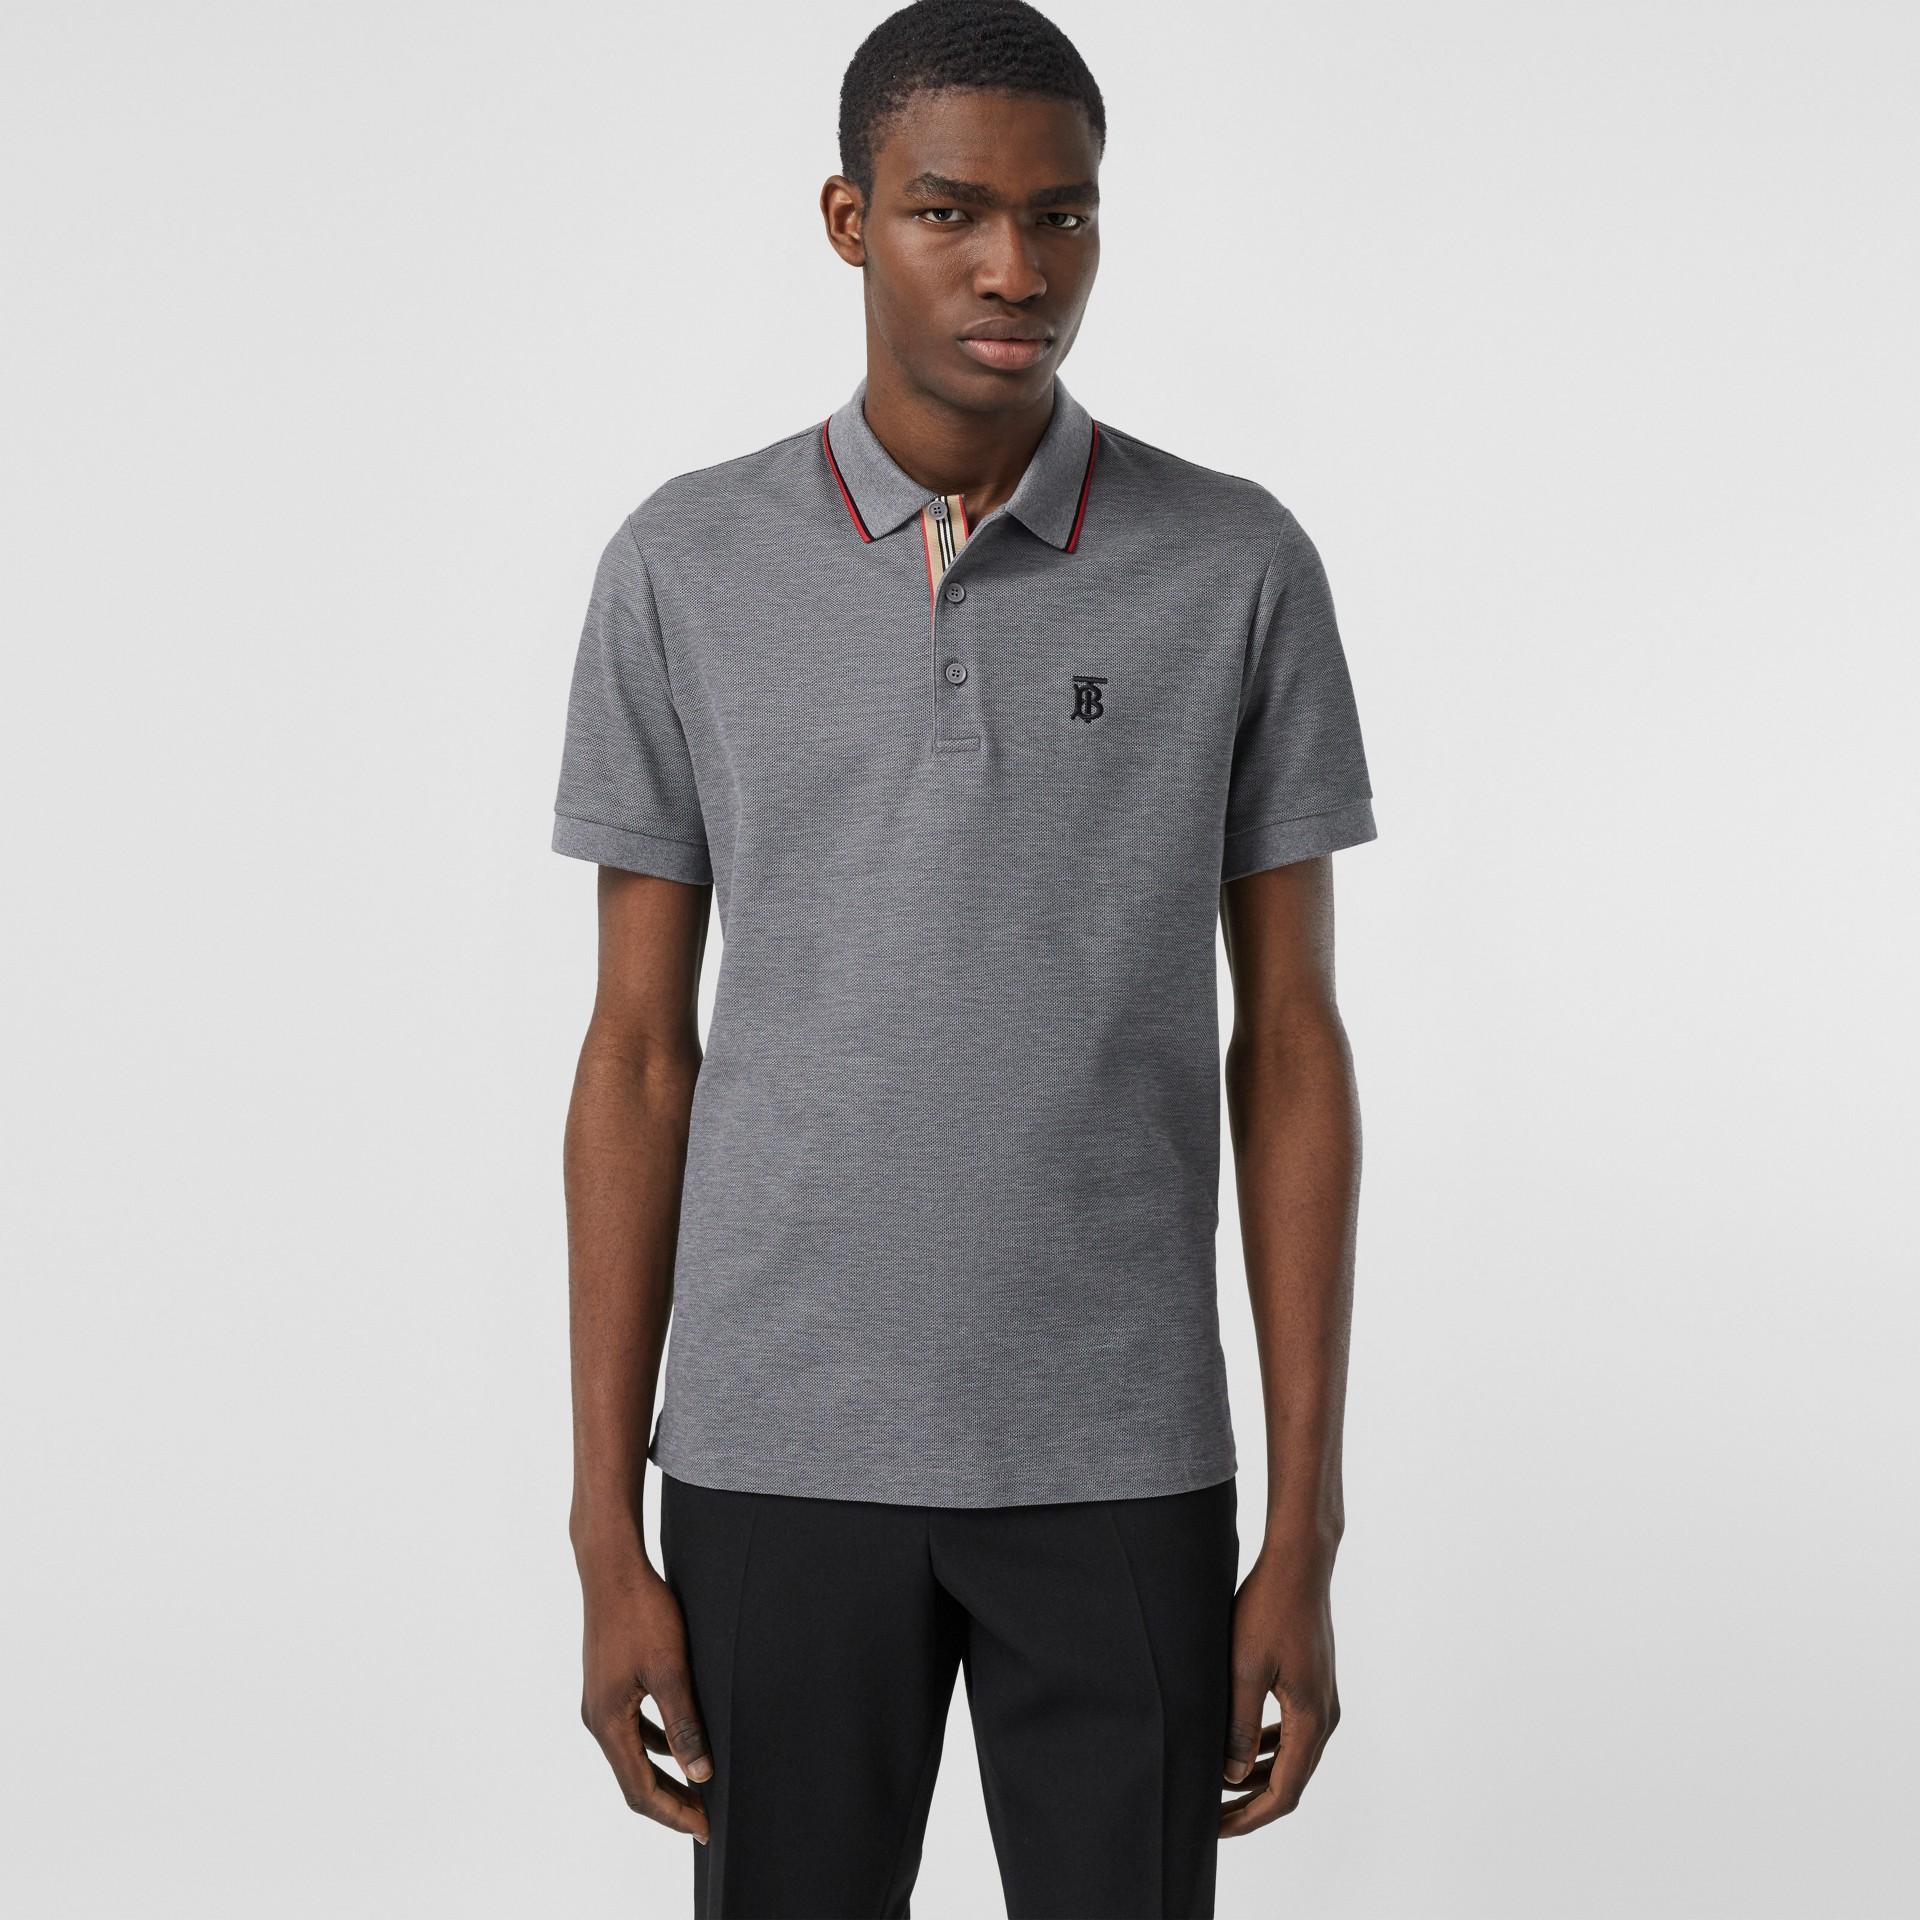 Monogram Motif Cotton Piqué Polo Shirt in Mid Grey Melange - Men | Burberry - gallery image 0